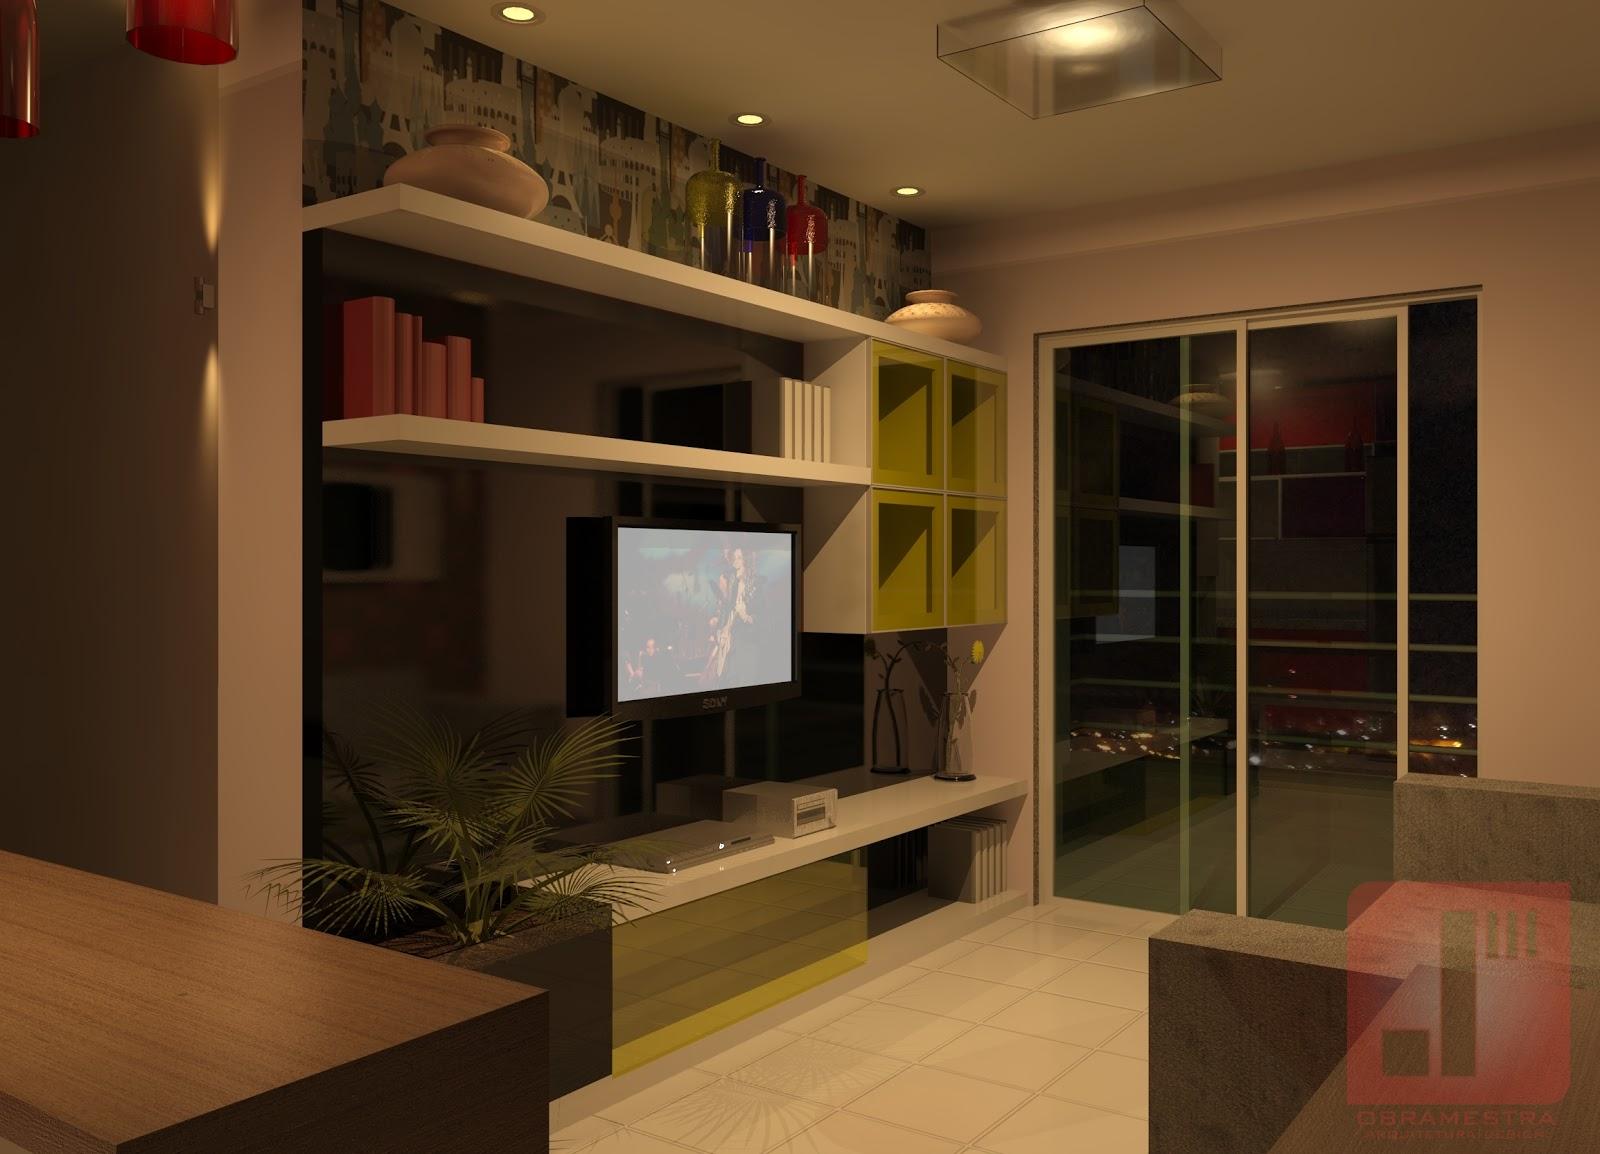 Design de ambientes - Apartamento 64 m²